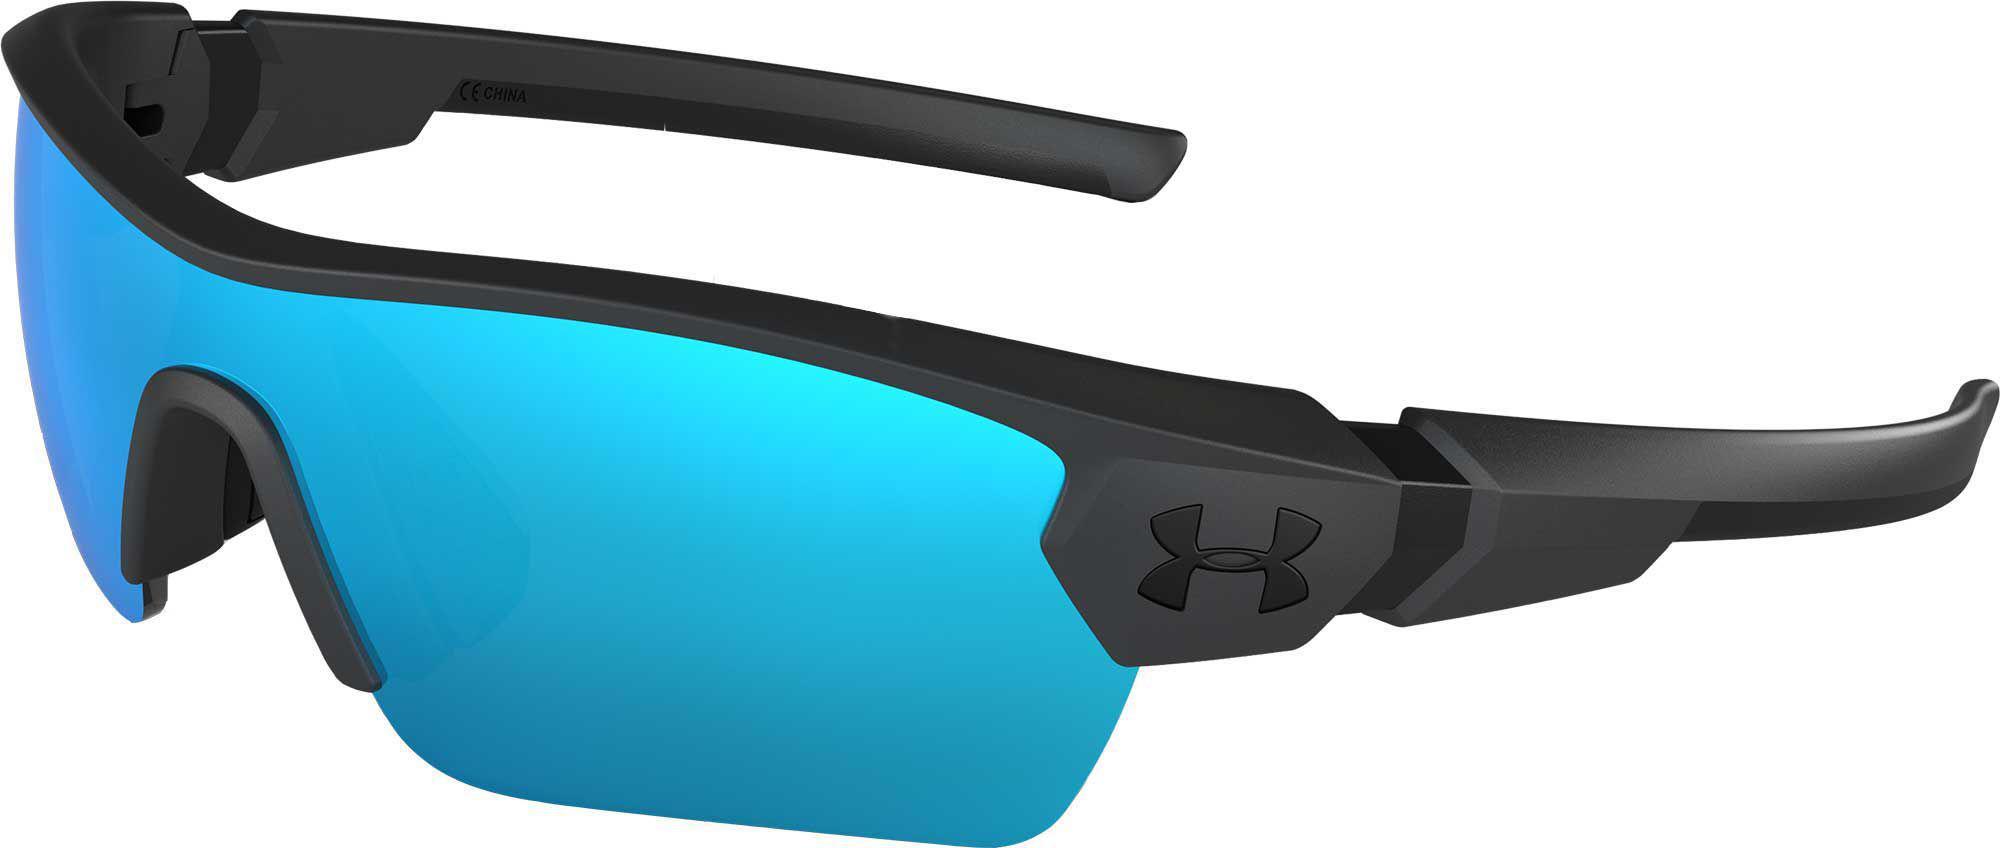 5aca70ef3a8 Lyst - Under Armour Octane Tuned Baseball softball Sunglasses in ...